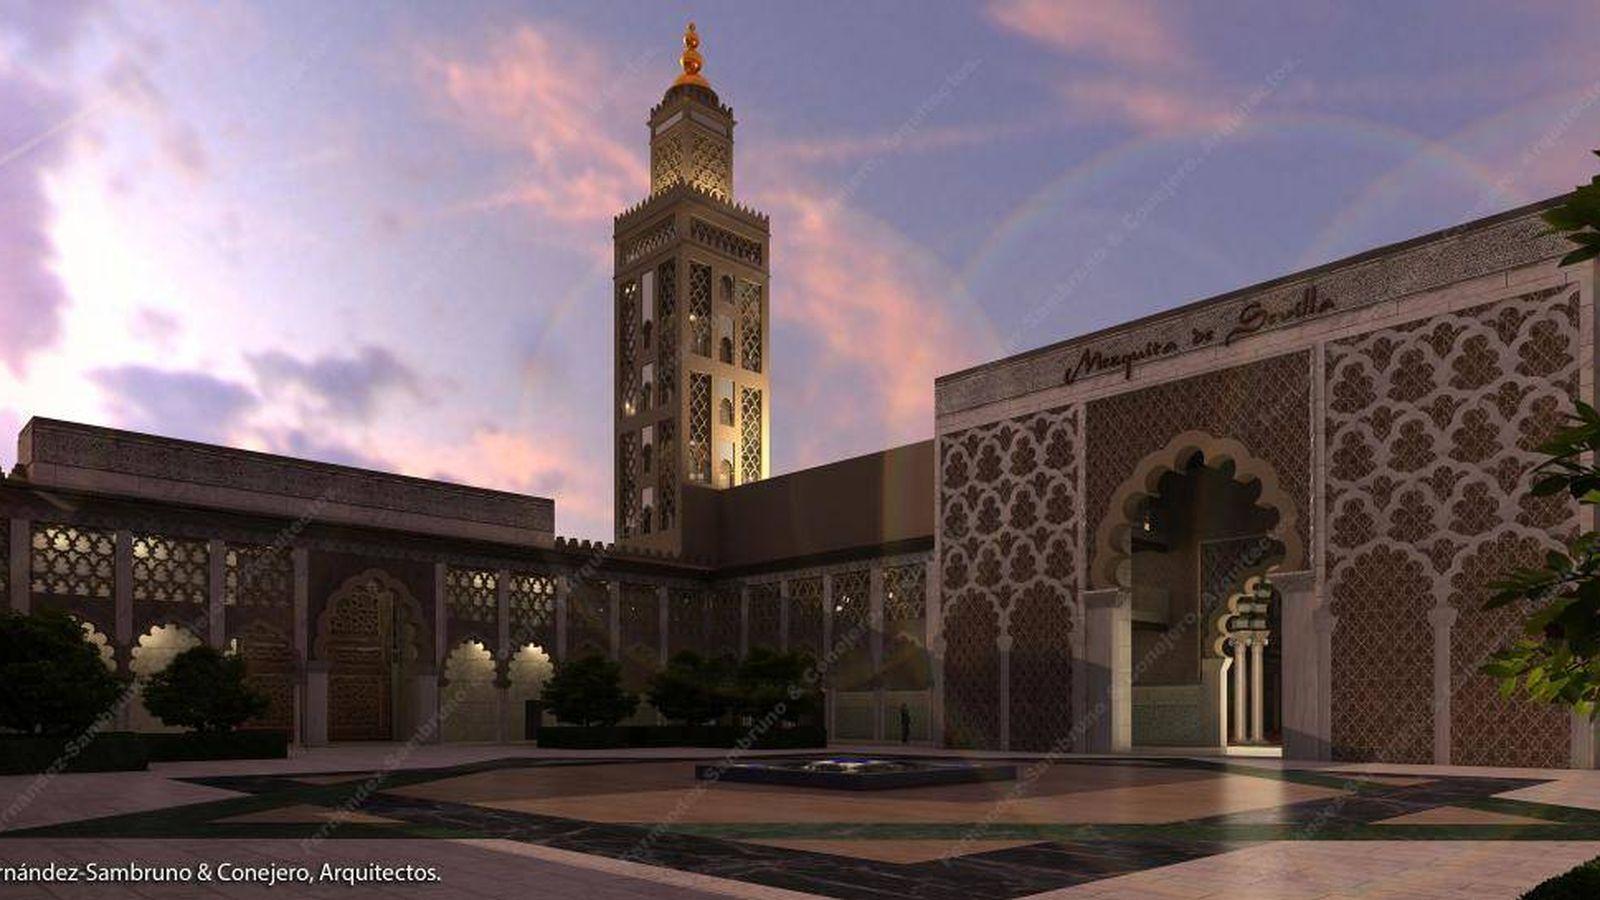 Noticias de andaluc a la gran mezquita de sevilla un - Empresas de construccion en sevilla ...